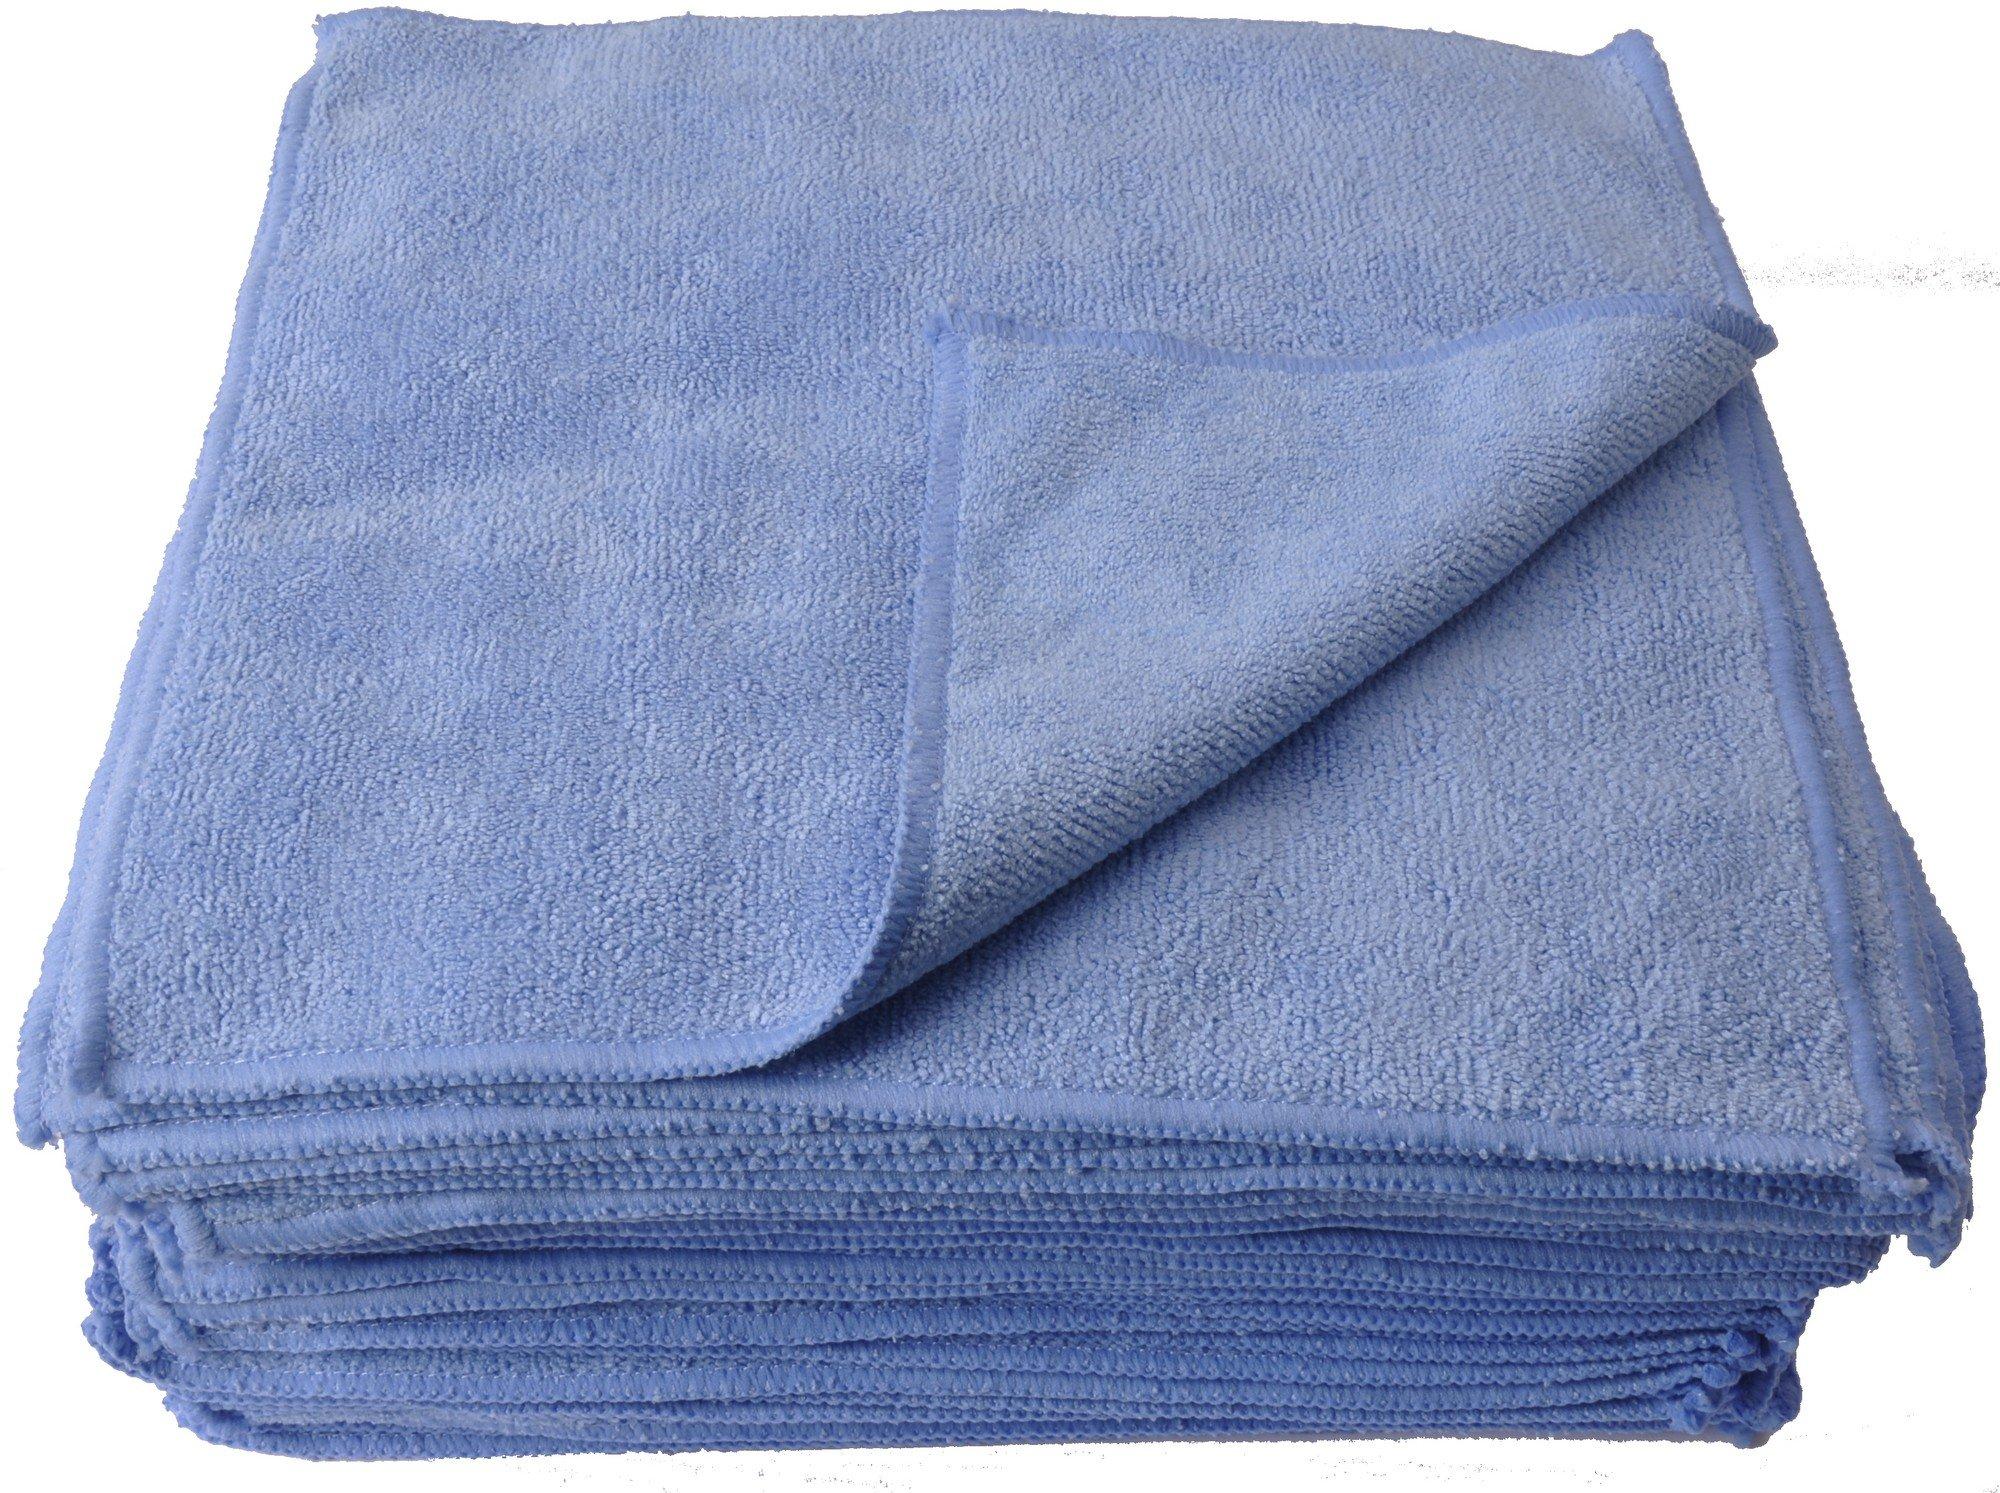 Eurow Microfiber Premium 350gsm Absorbent Cleaning Towels 12 x 12 Bulk 50 Pack Blue